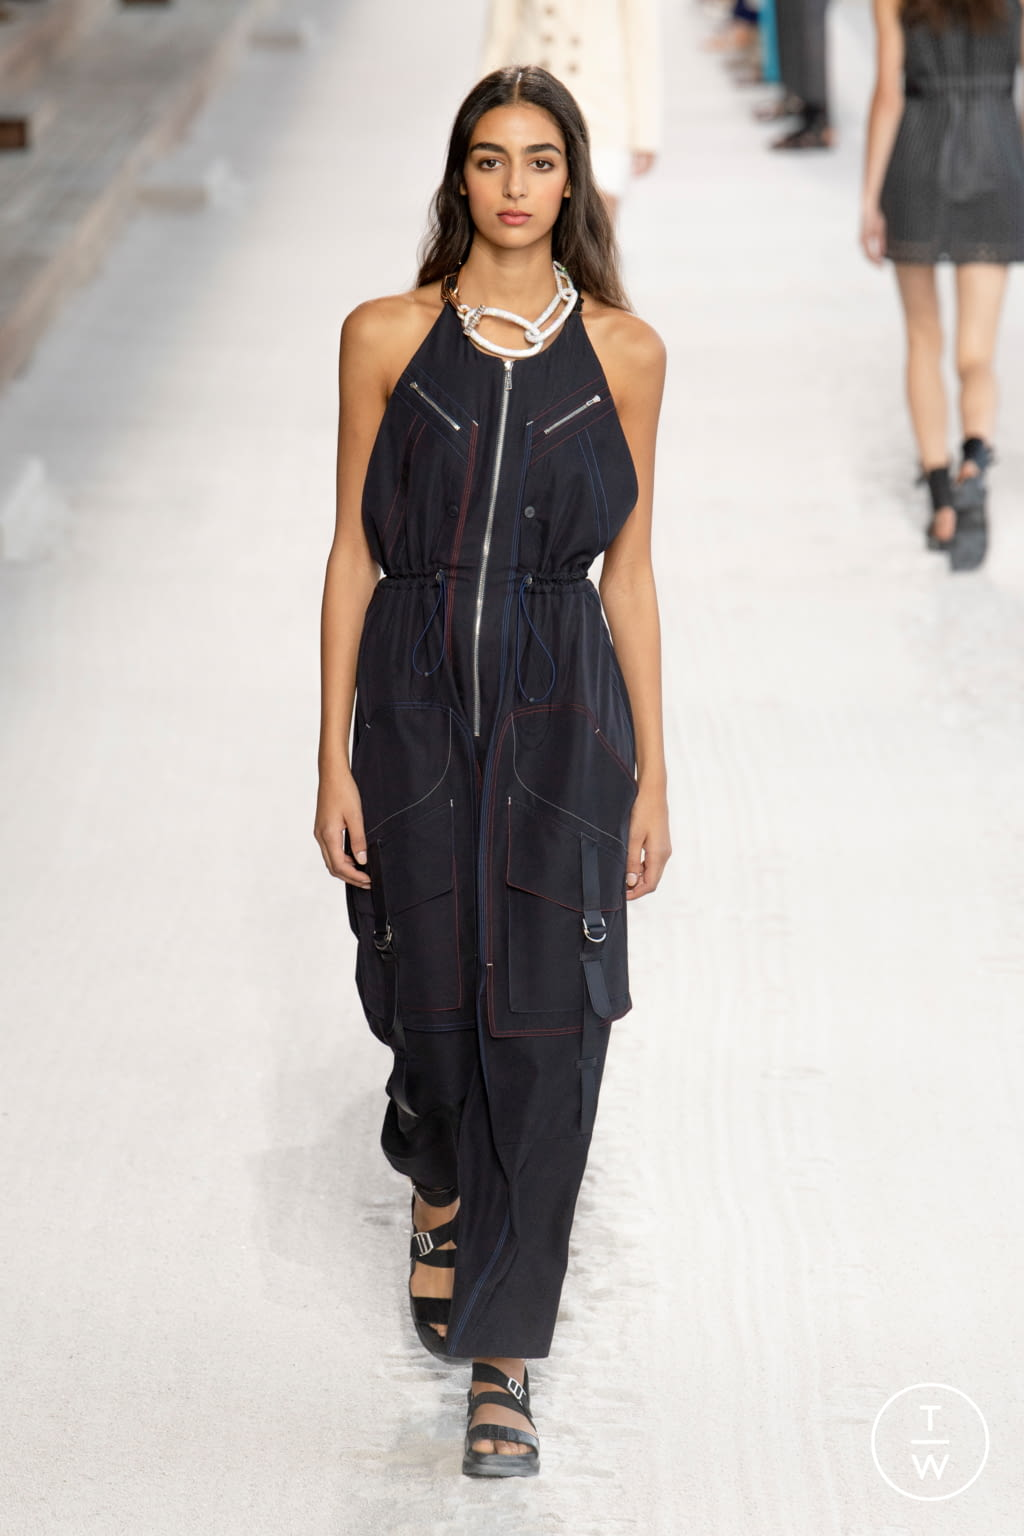 Abiti Da Sera Hermes.Hermes S S19 Womenswear 37 The Fashion Search Engine Tagwalk